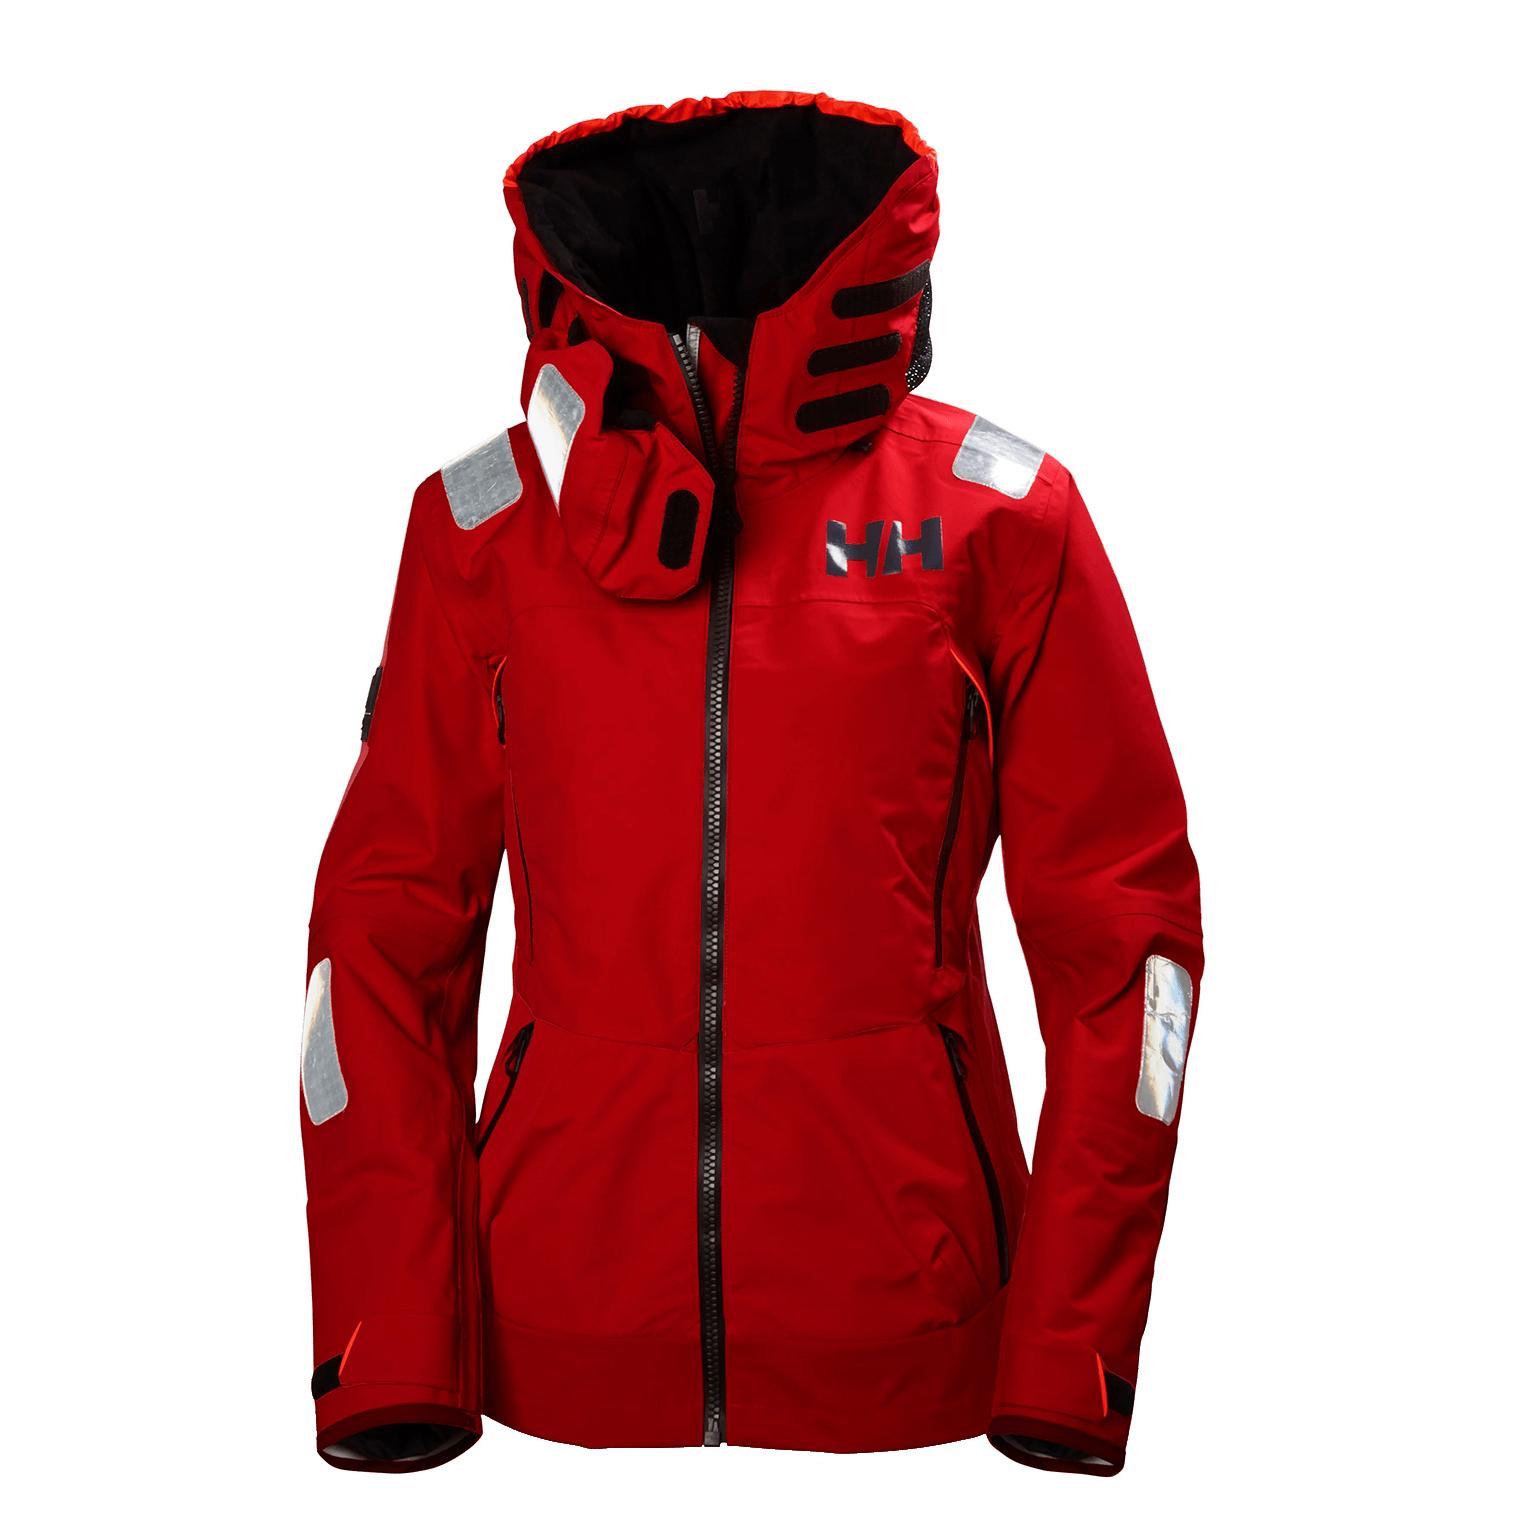 Helly Hansen Women's Aegir Race Jacket (33884)